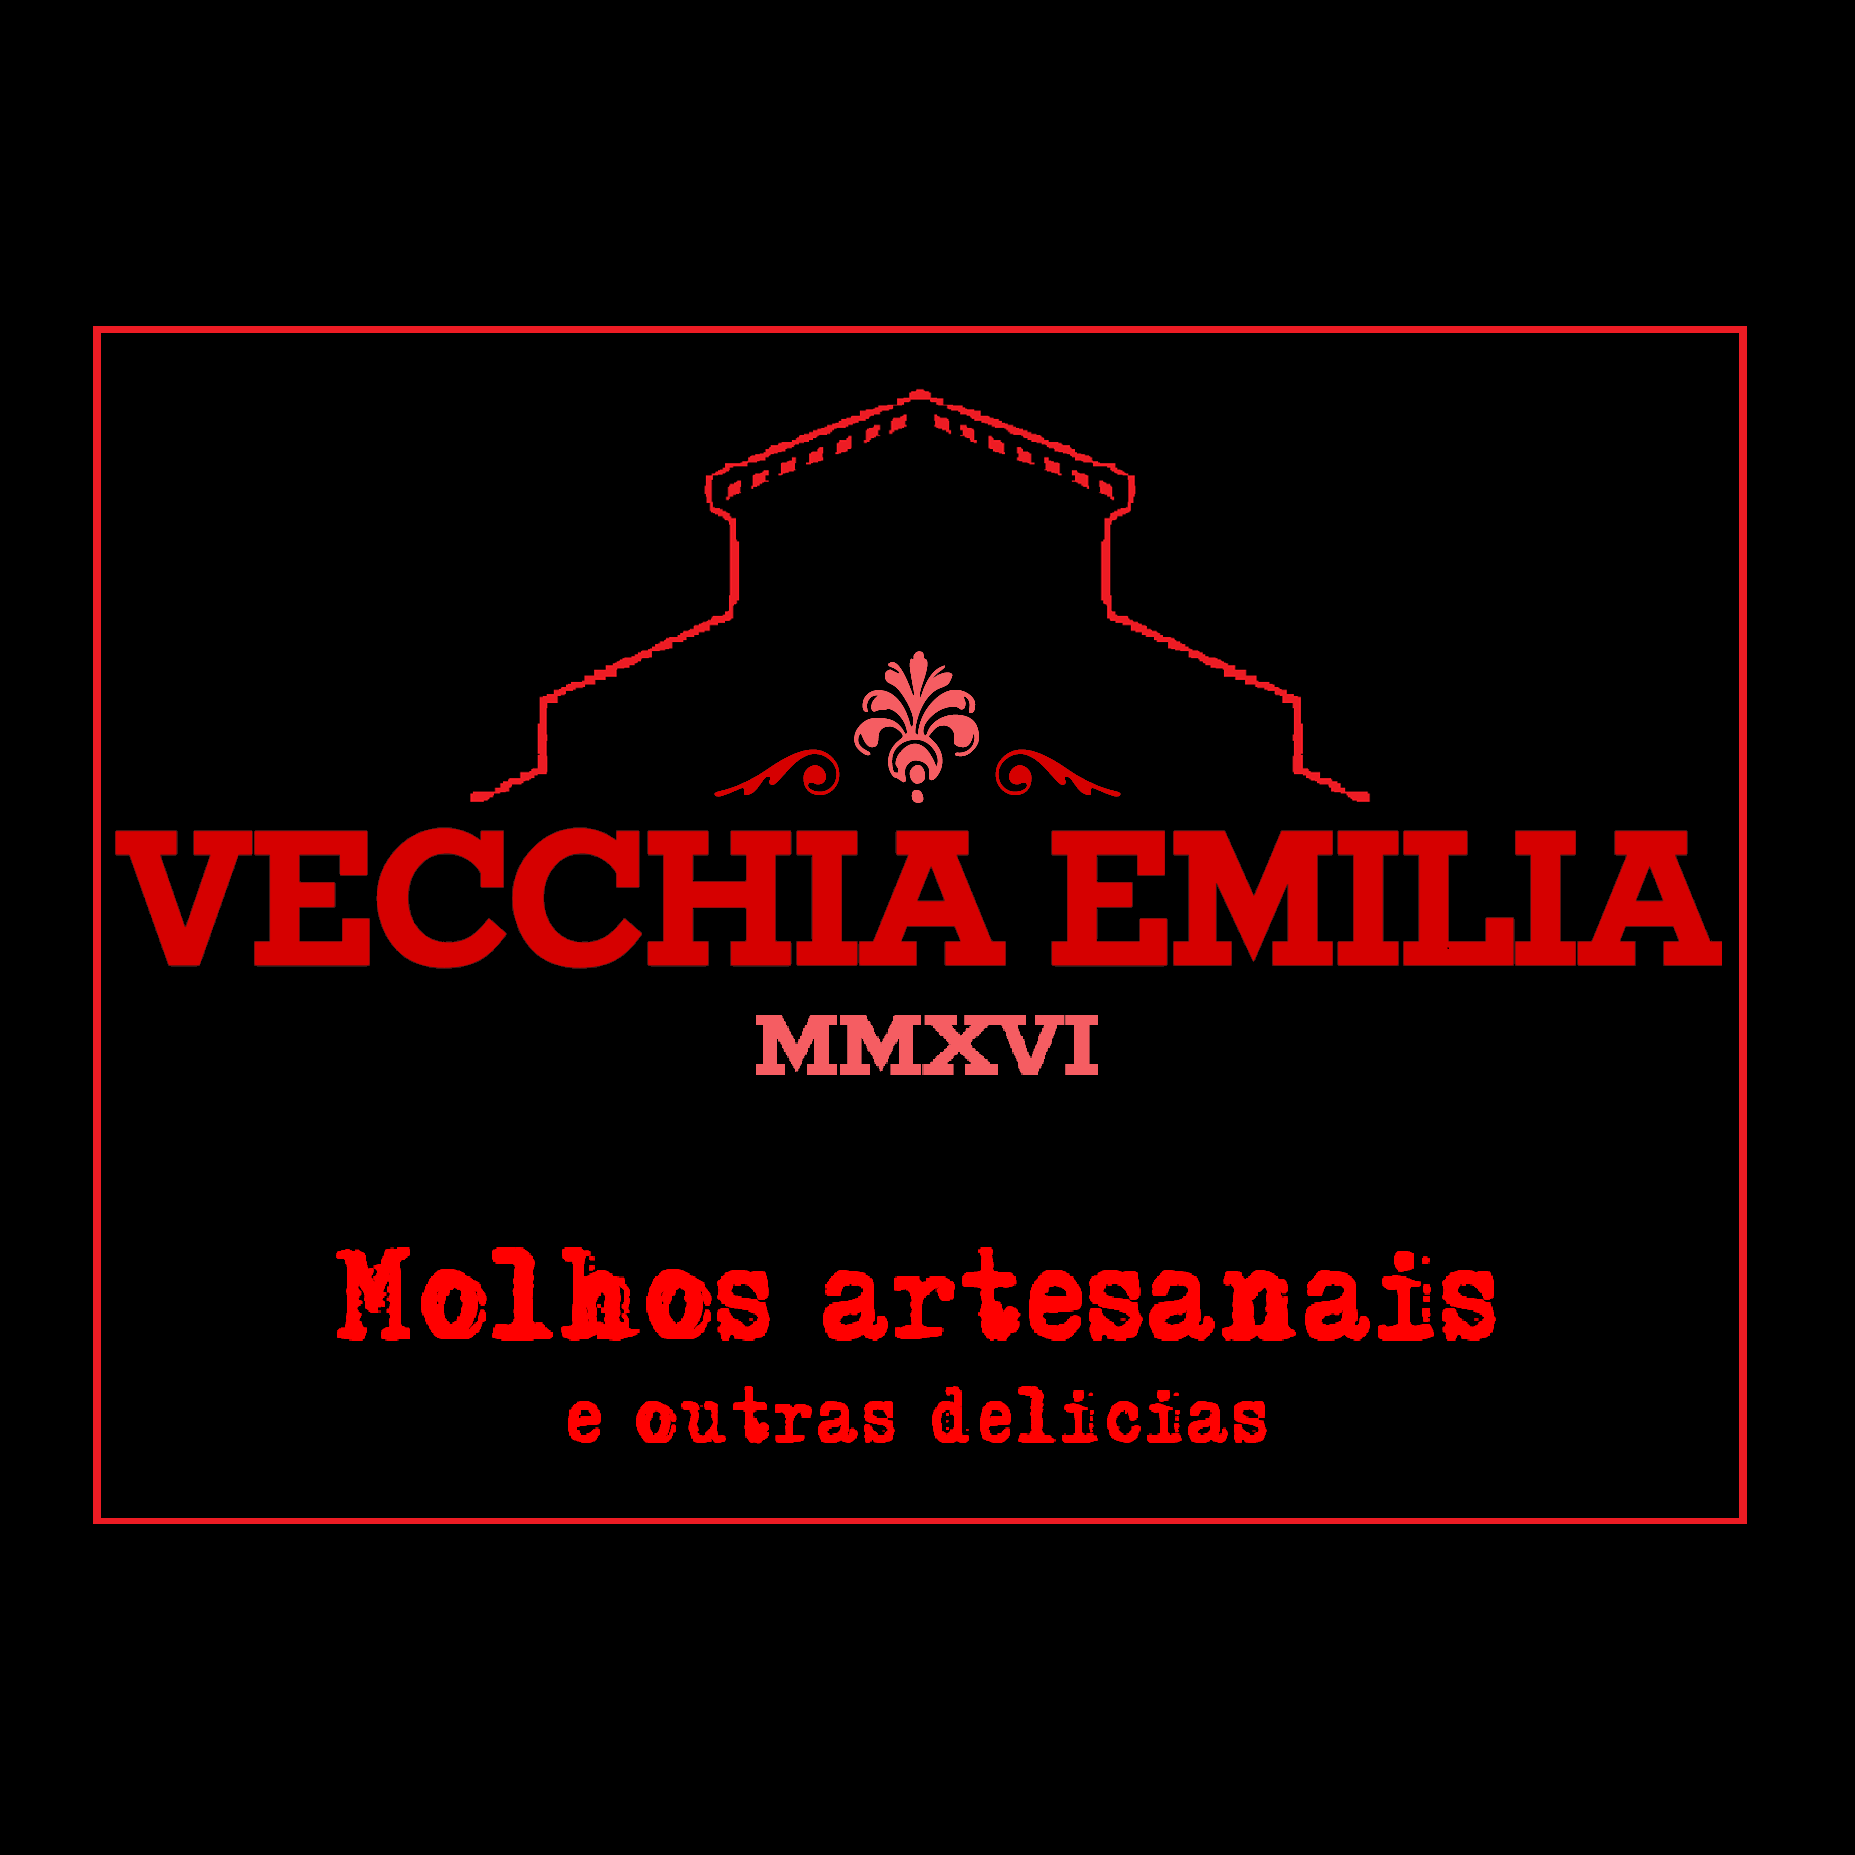 Brand vecchia emilia